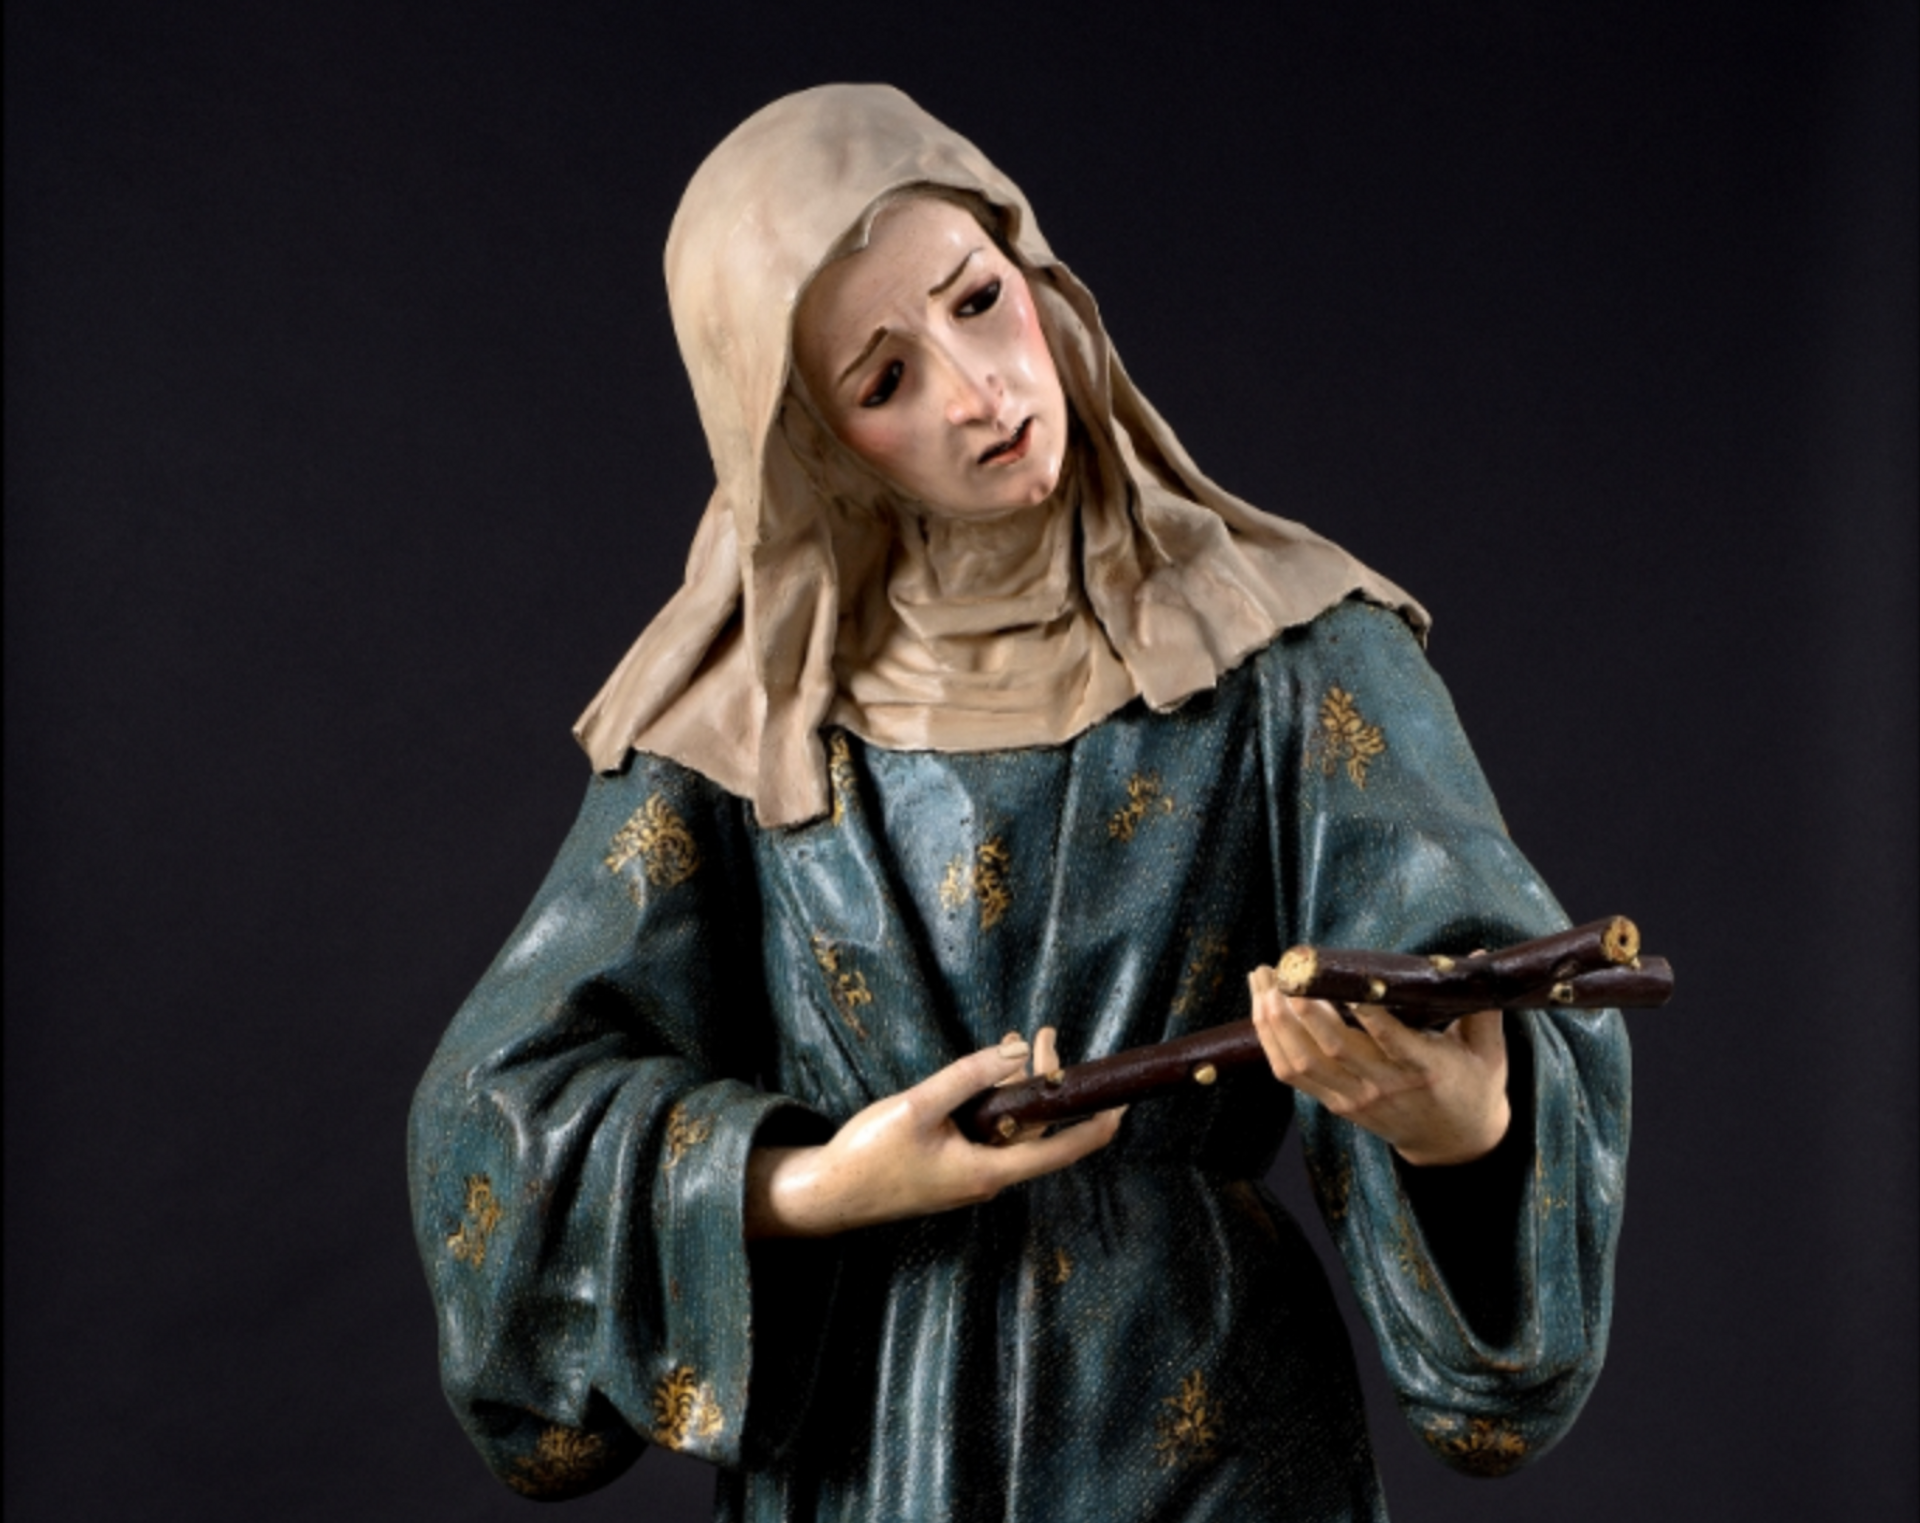 Saint Margaret of Cortona, by the Baroque artist José de Mora, offered by the dealer Nicolás Cortés at Tefaf New York